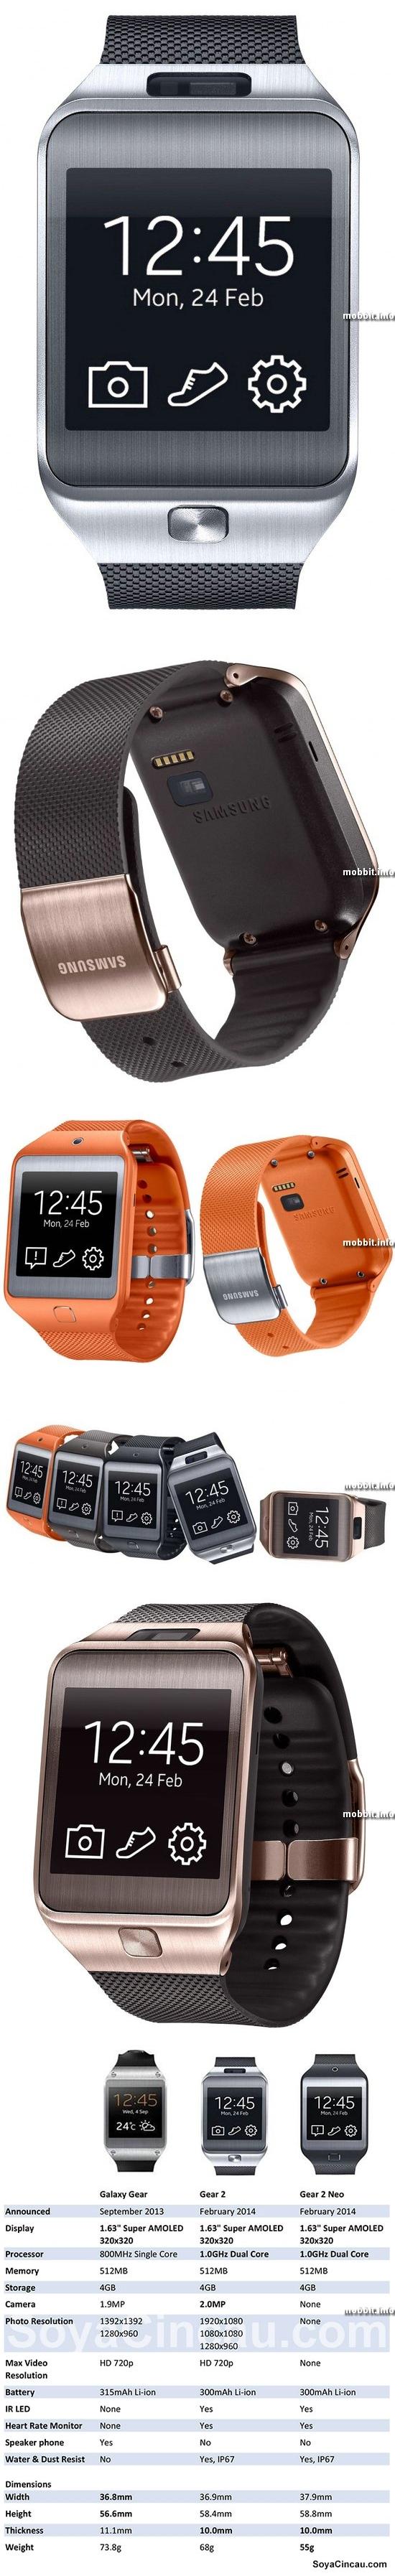 Samsung Gear 2 и Gear 2 Neo